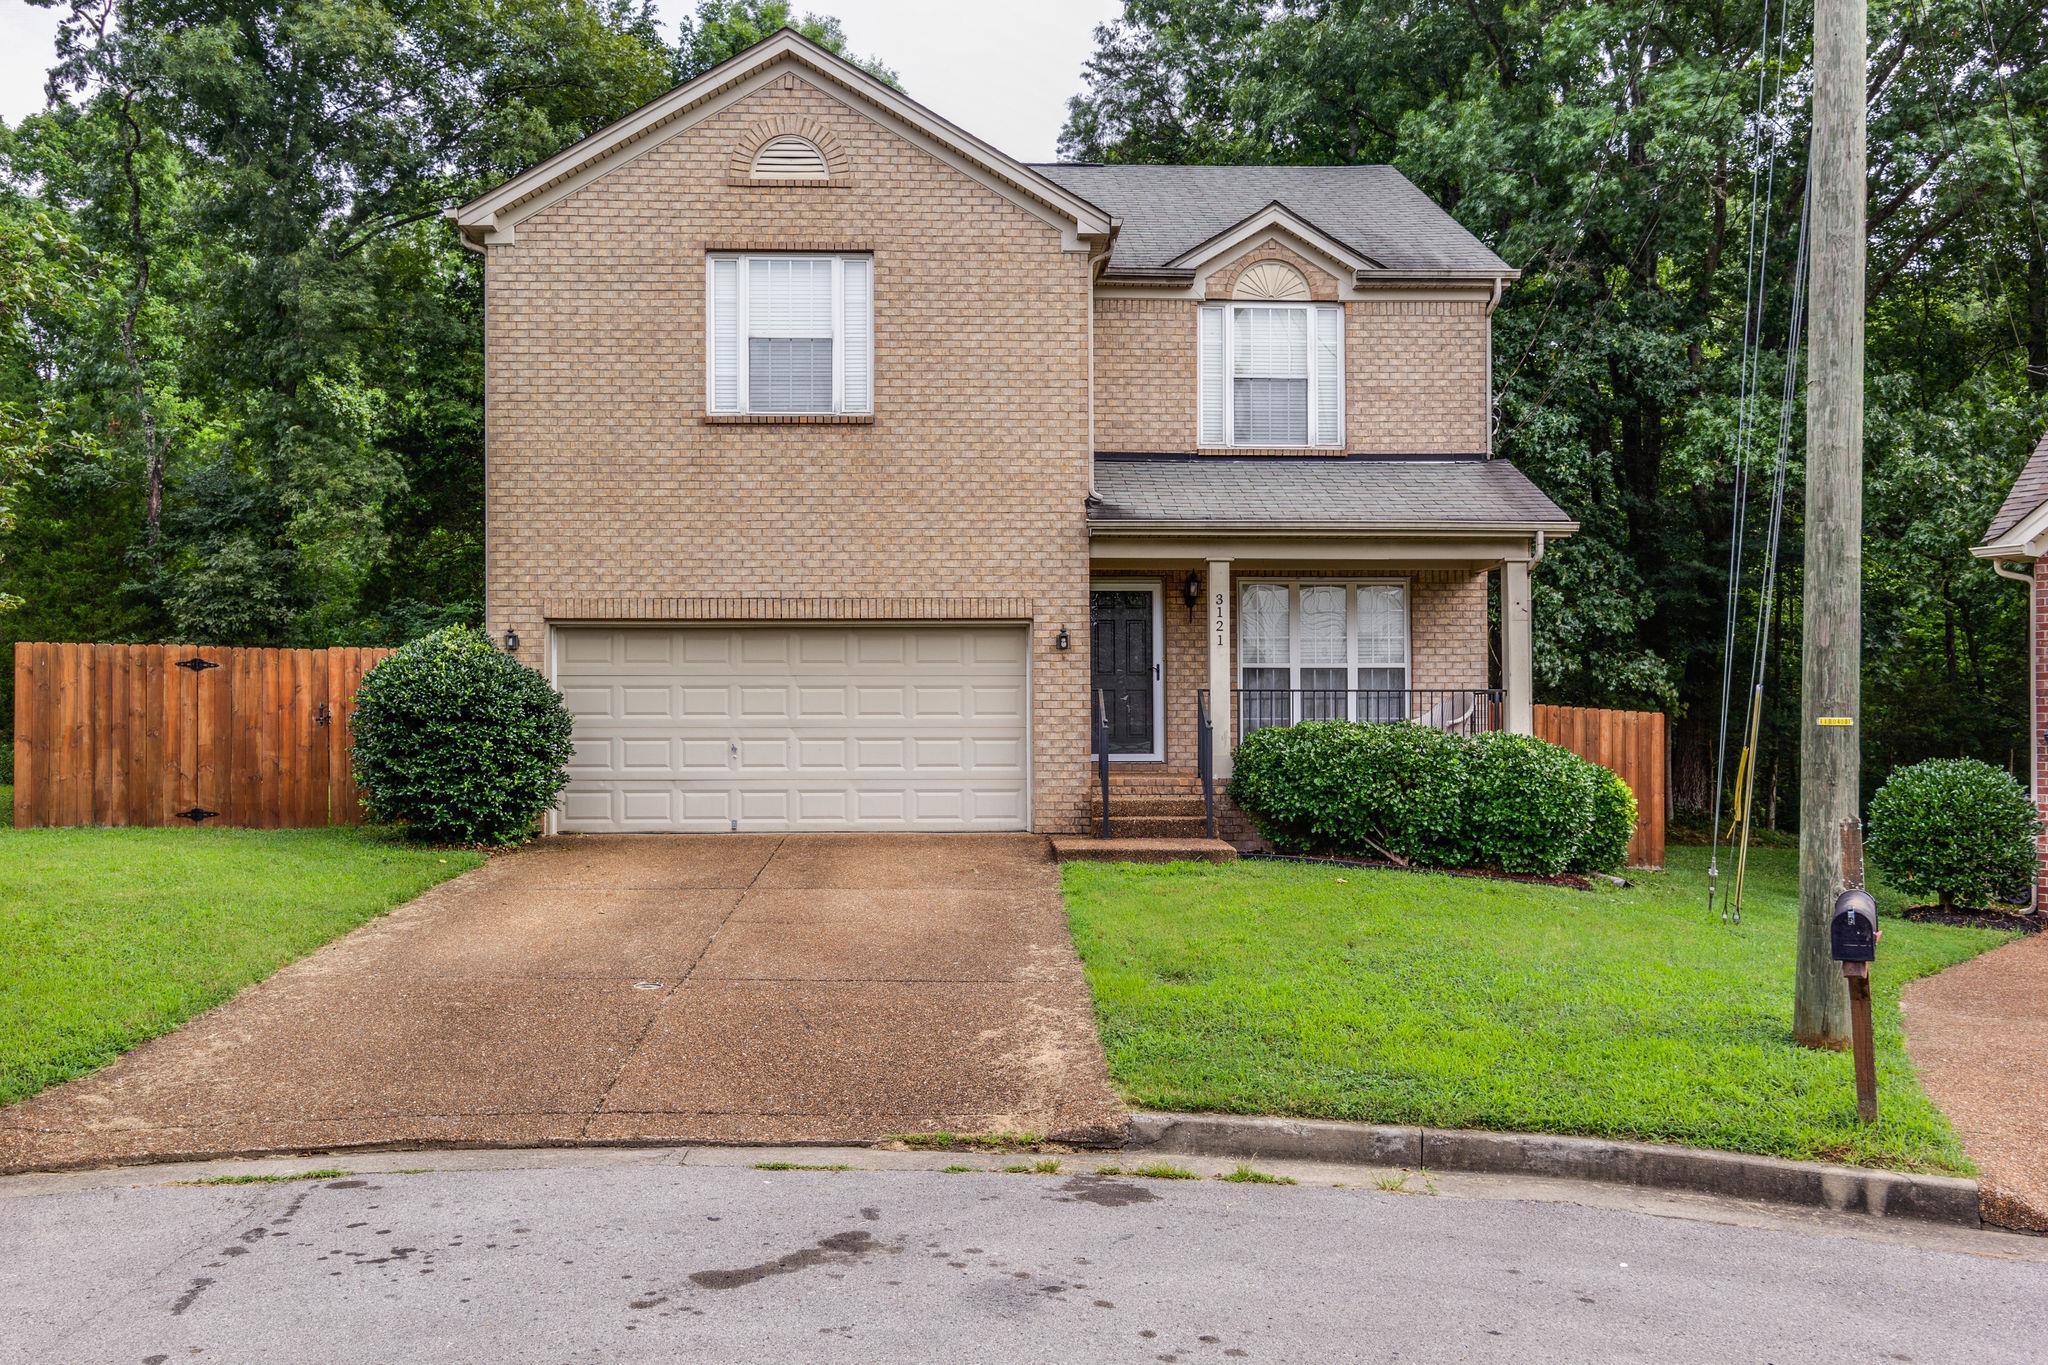 3121 Demetros Pl, Nashville, TN 37217 - Nashville, TN real estate listing